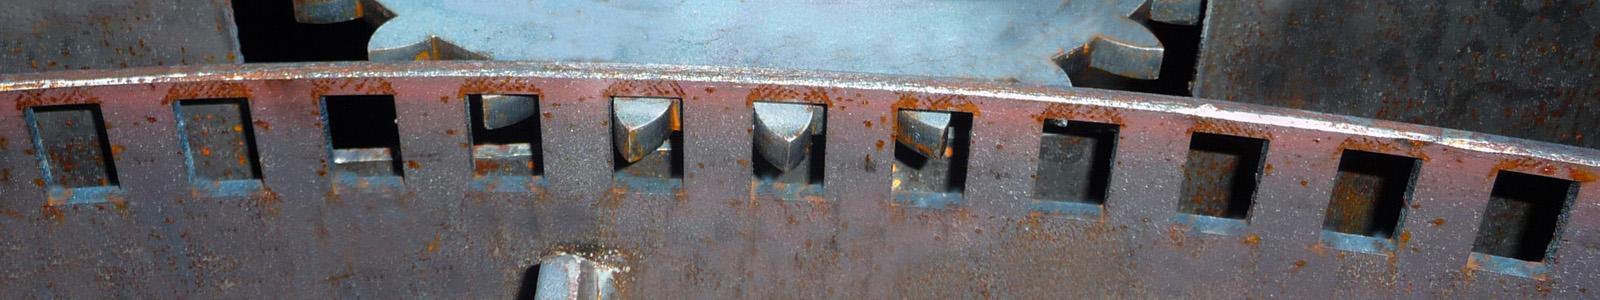 Cabinet Washers Manufacturer Kemac Trimac Industrial